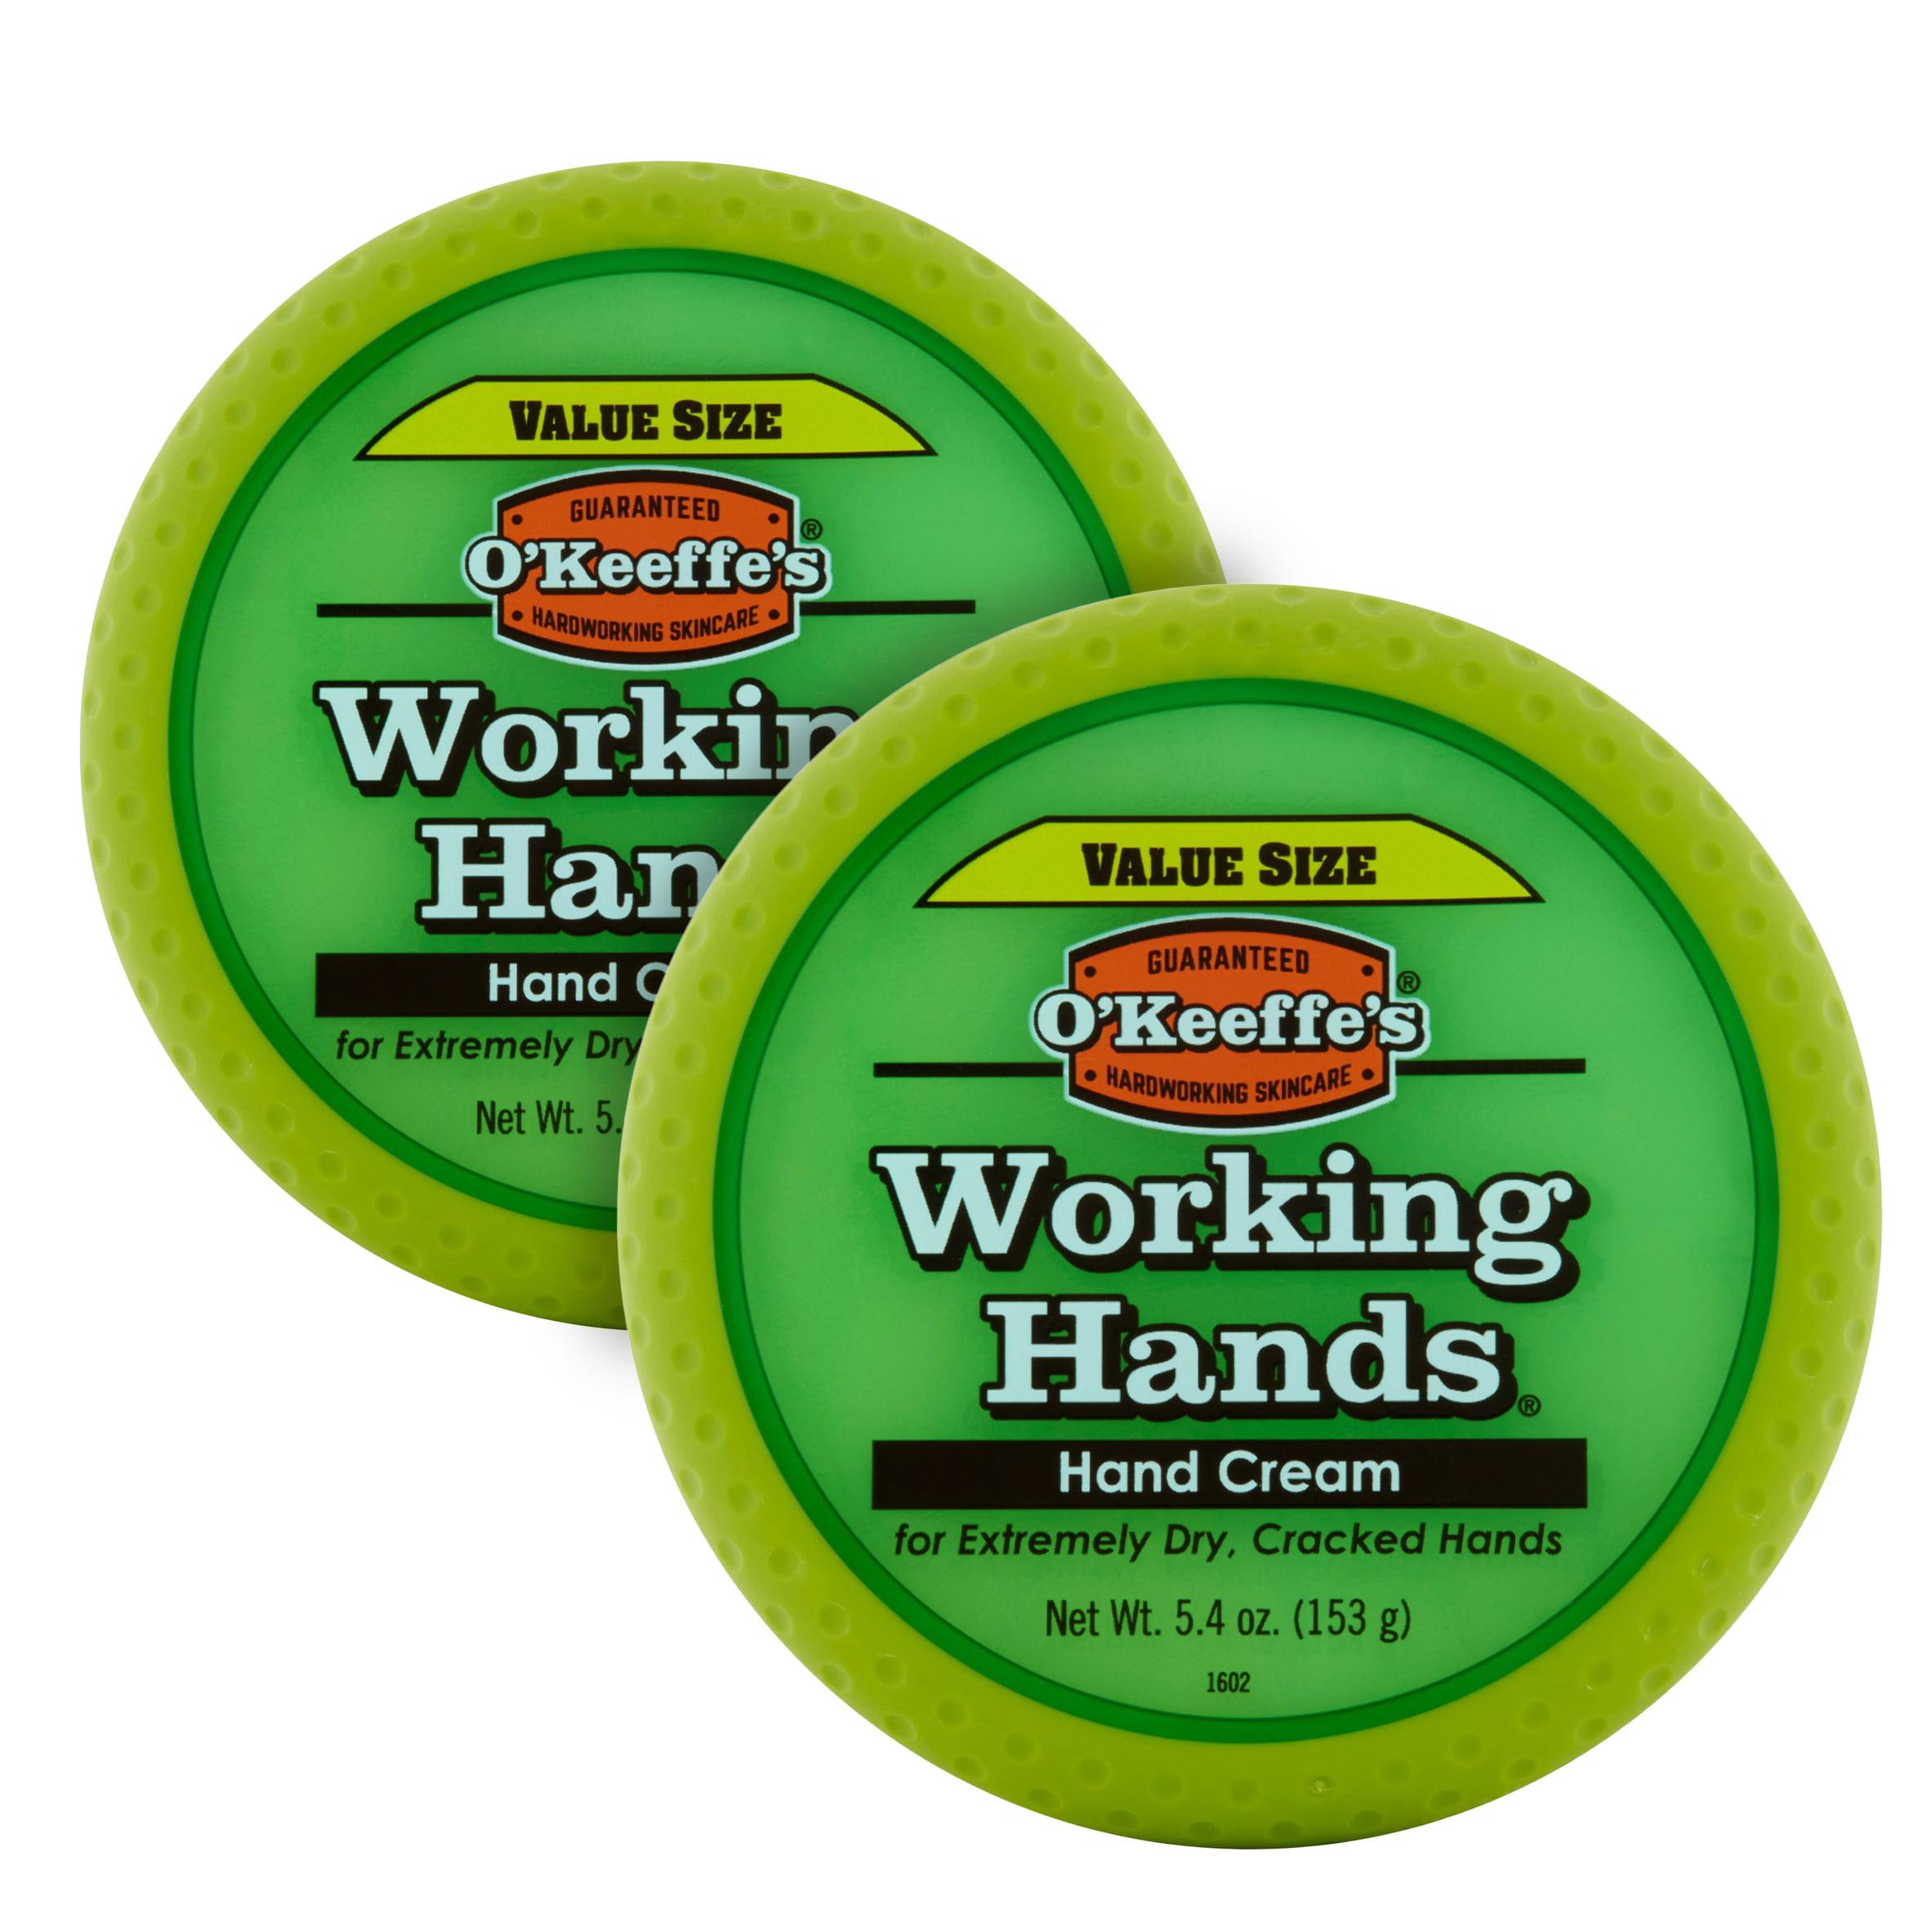 2 pack) O'Keeffe's Working Hands Hand Cream, 5.4 oz., Jar - Walmart.com -  Walmart.com